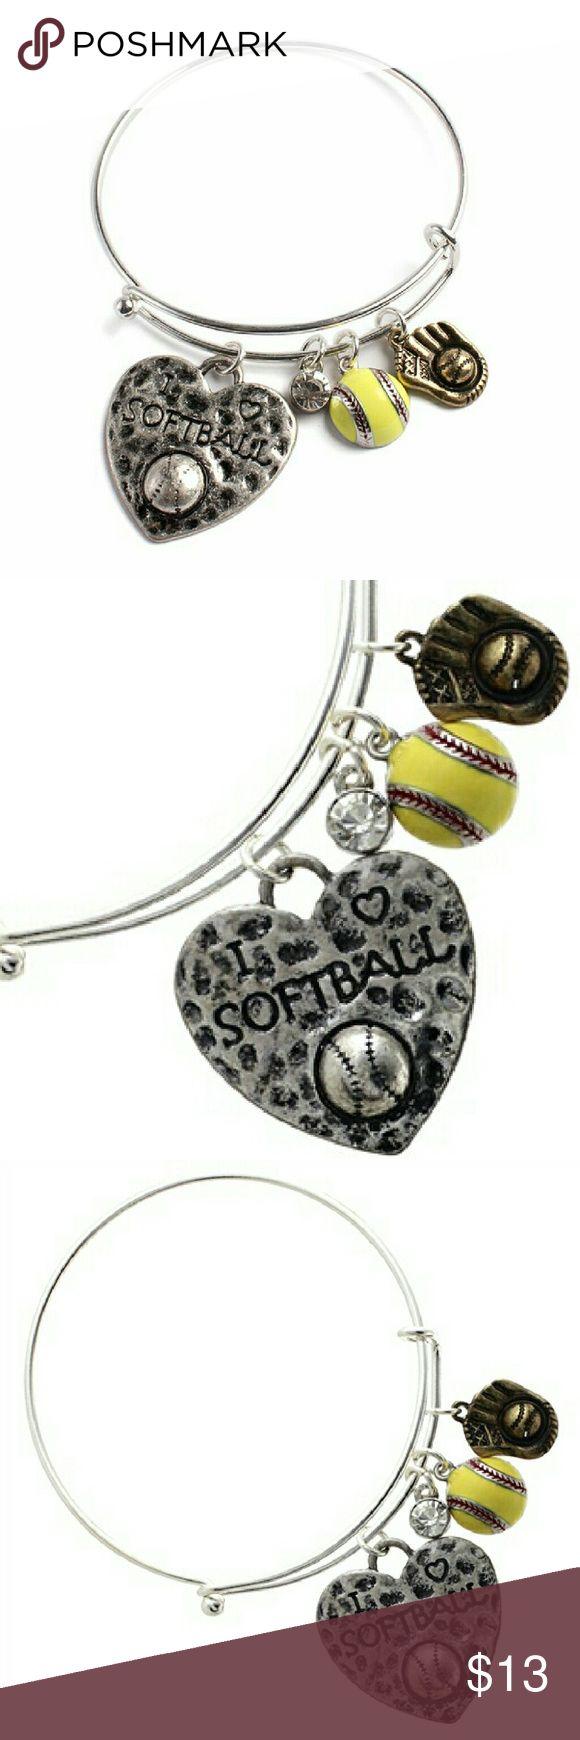 Softball Charm Bracelet Boutique